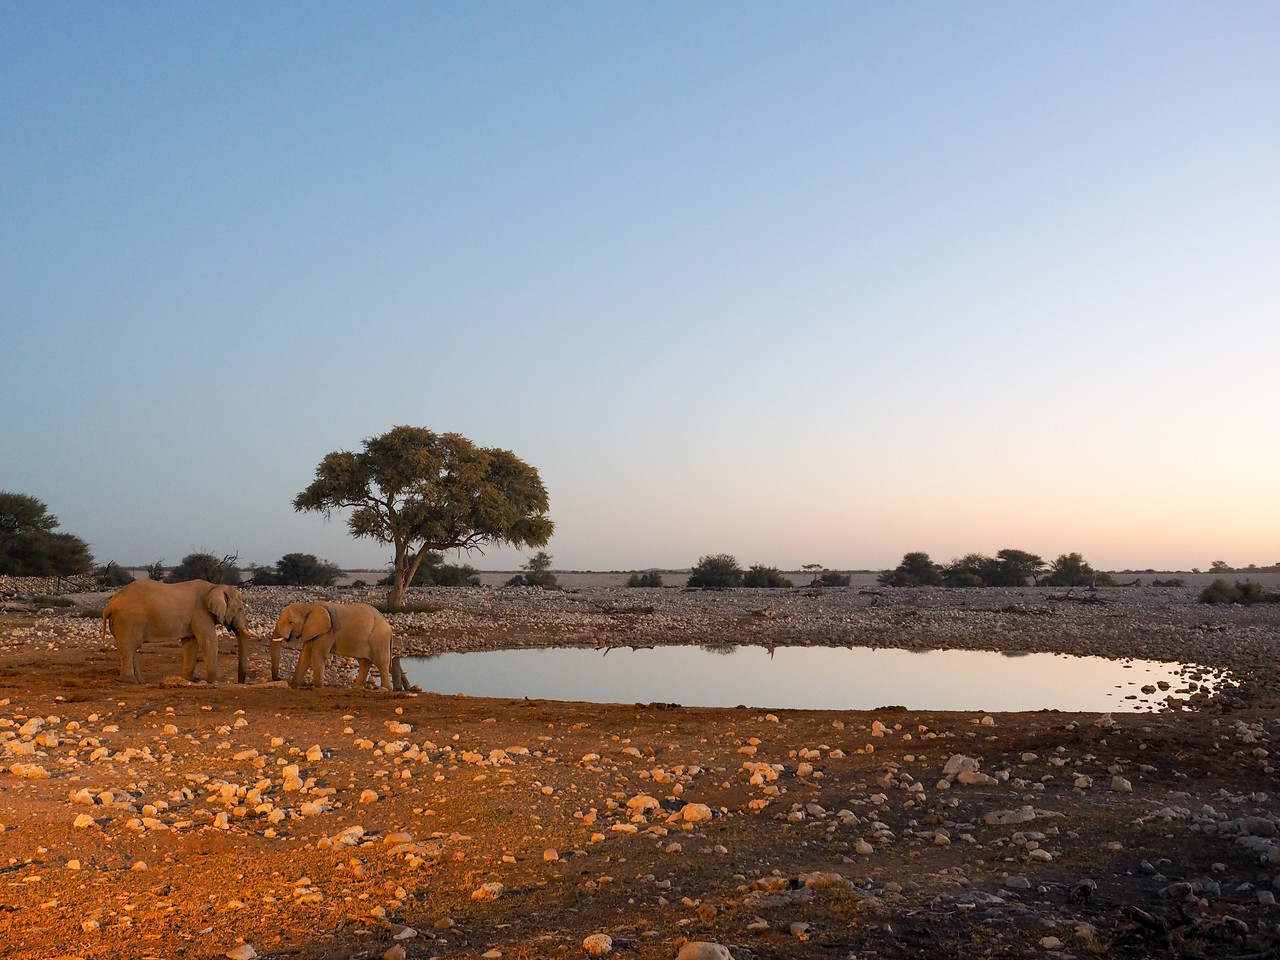 Elephants at the watering hole at Okaukuejo Camp in Etosha